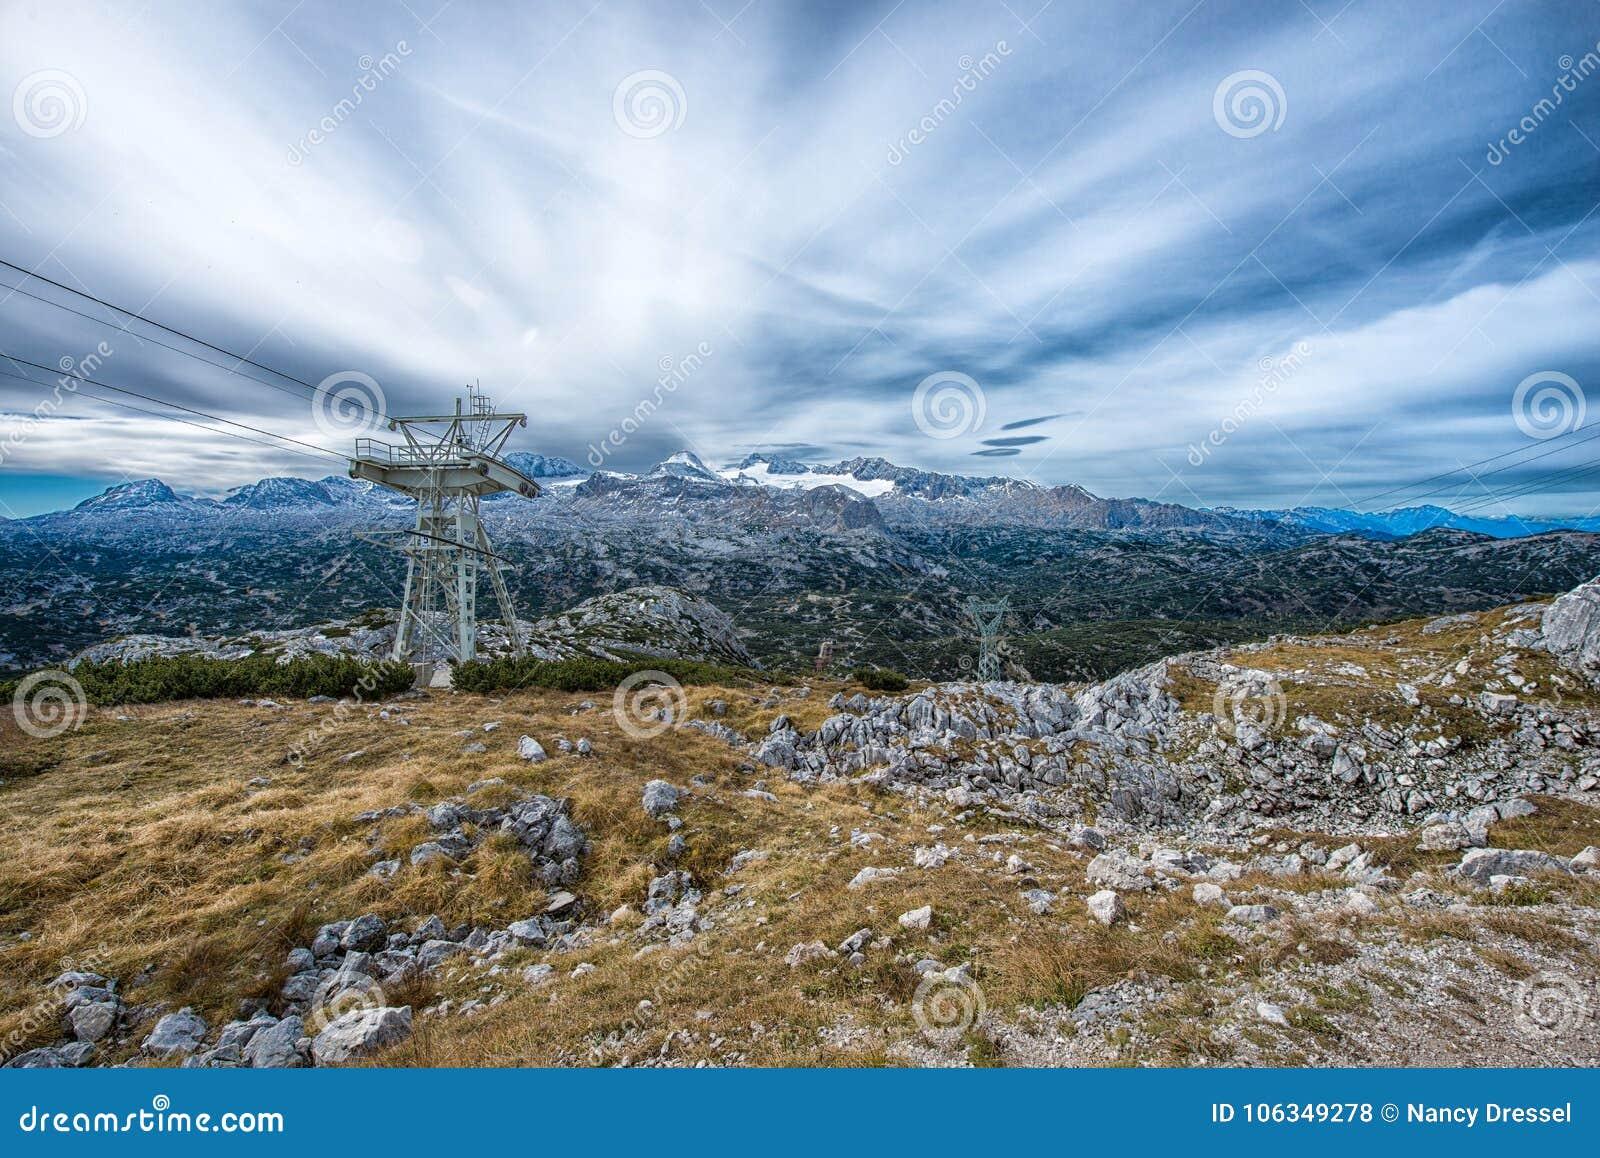 peak view to the spectacular Dachstein glacier in the Alps, Austria,